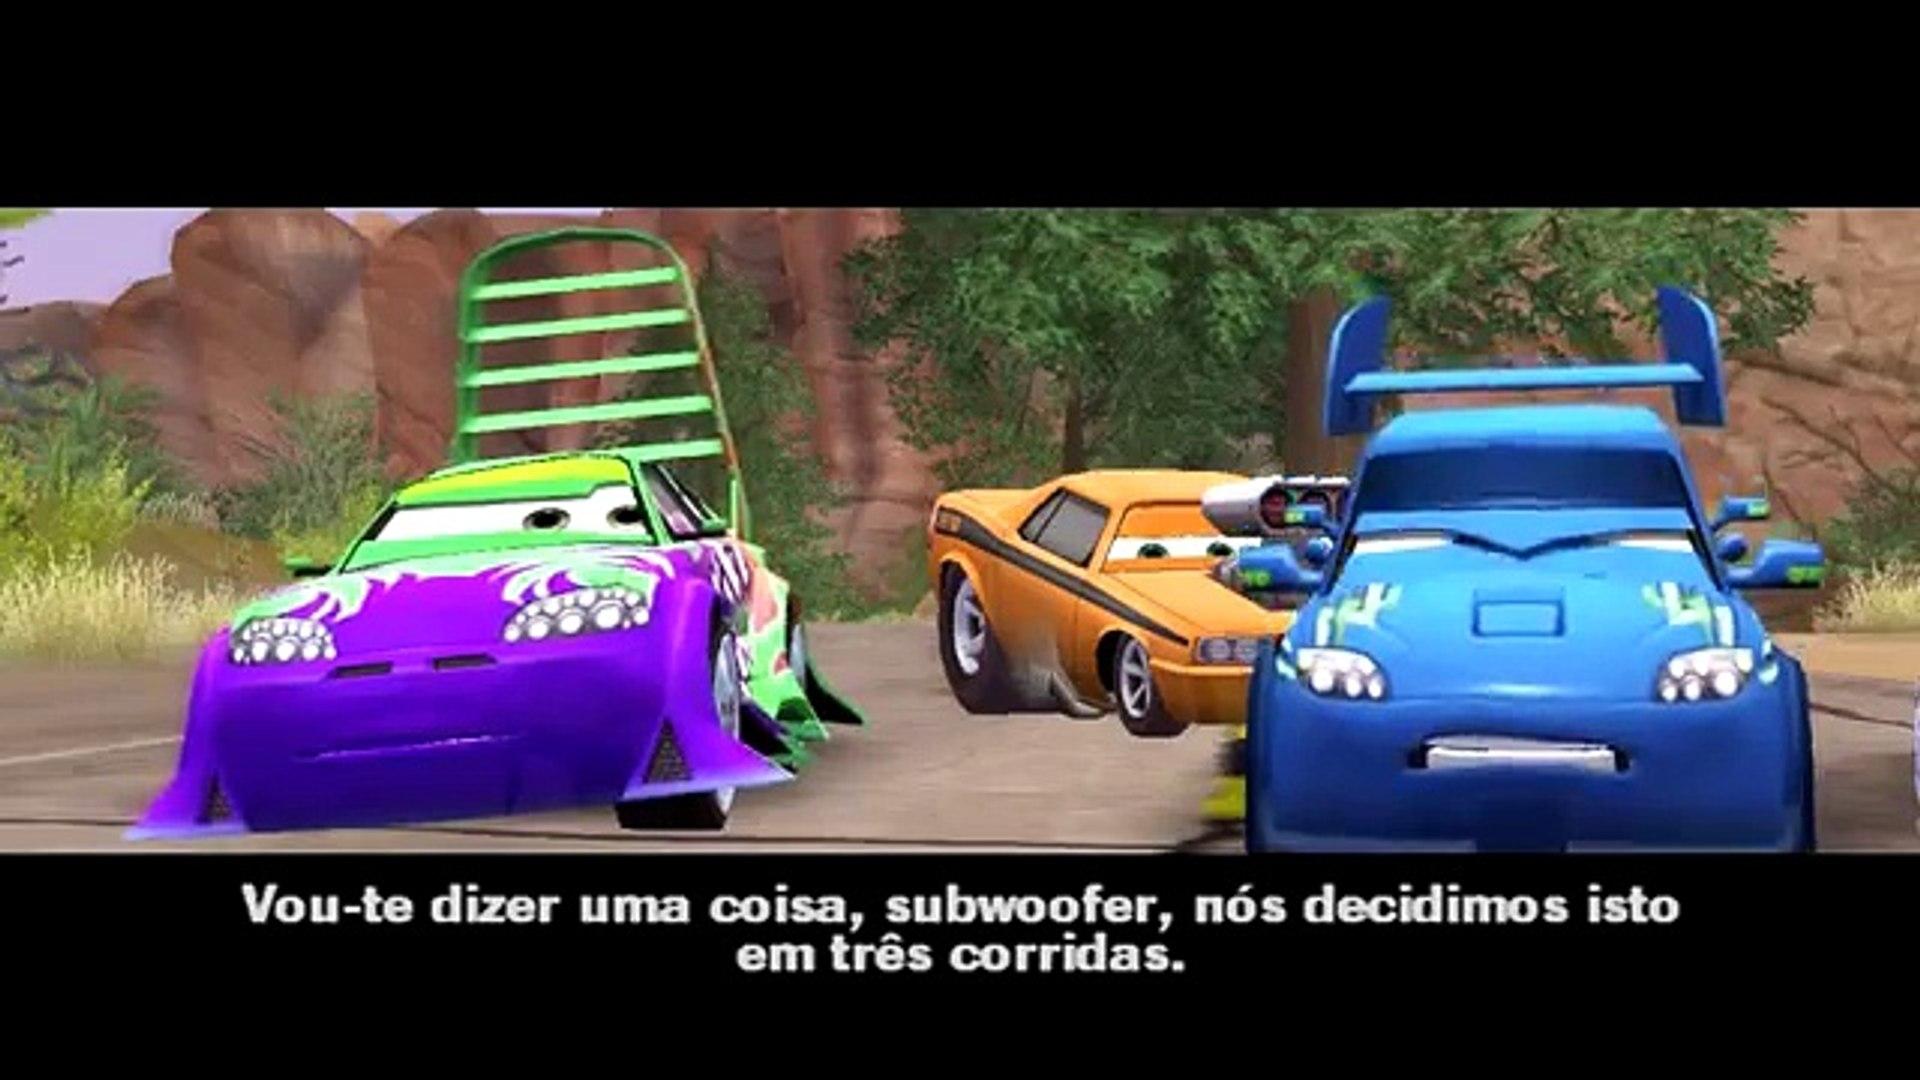 Relampago Mcqueen Turbo Carros Tuning Carros Portugues Legendado Filme Jogo Video Dailymotion